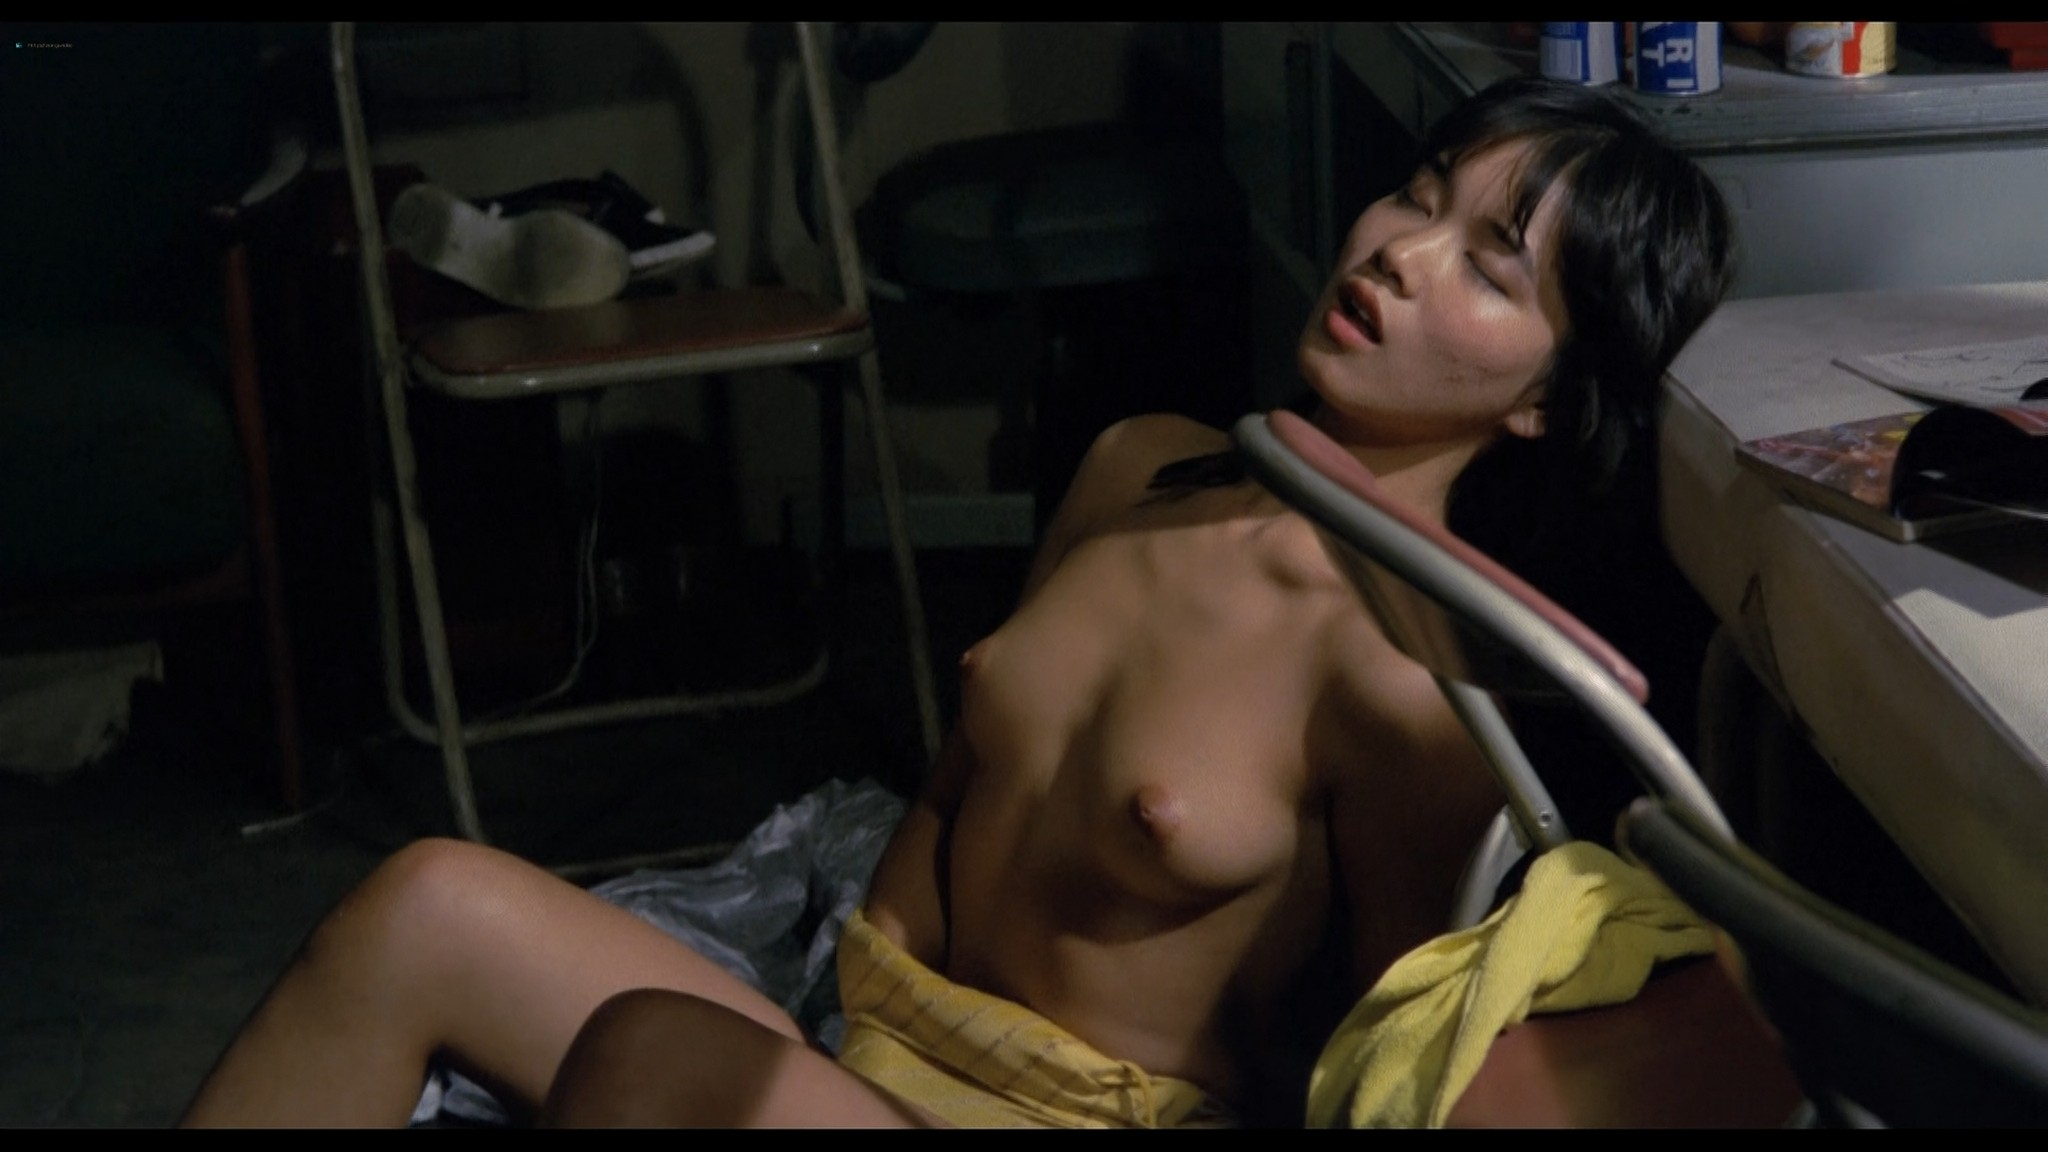 Natsuko Yamamoto nude Kaoru Oda nude lot of sex Beautiful Wrestlers Down for the Count JP 1984 1080p BluRay REMUX 10